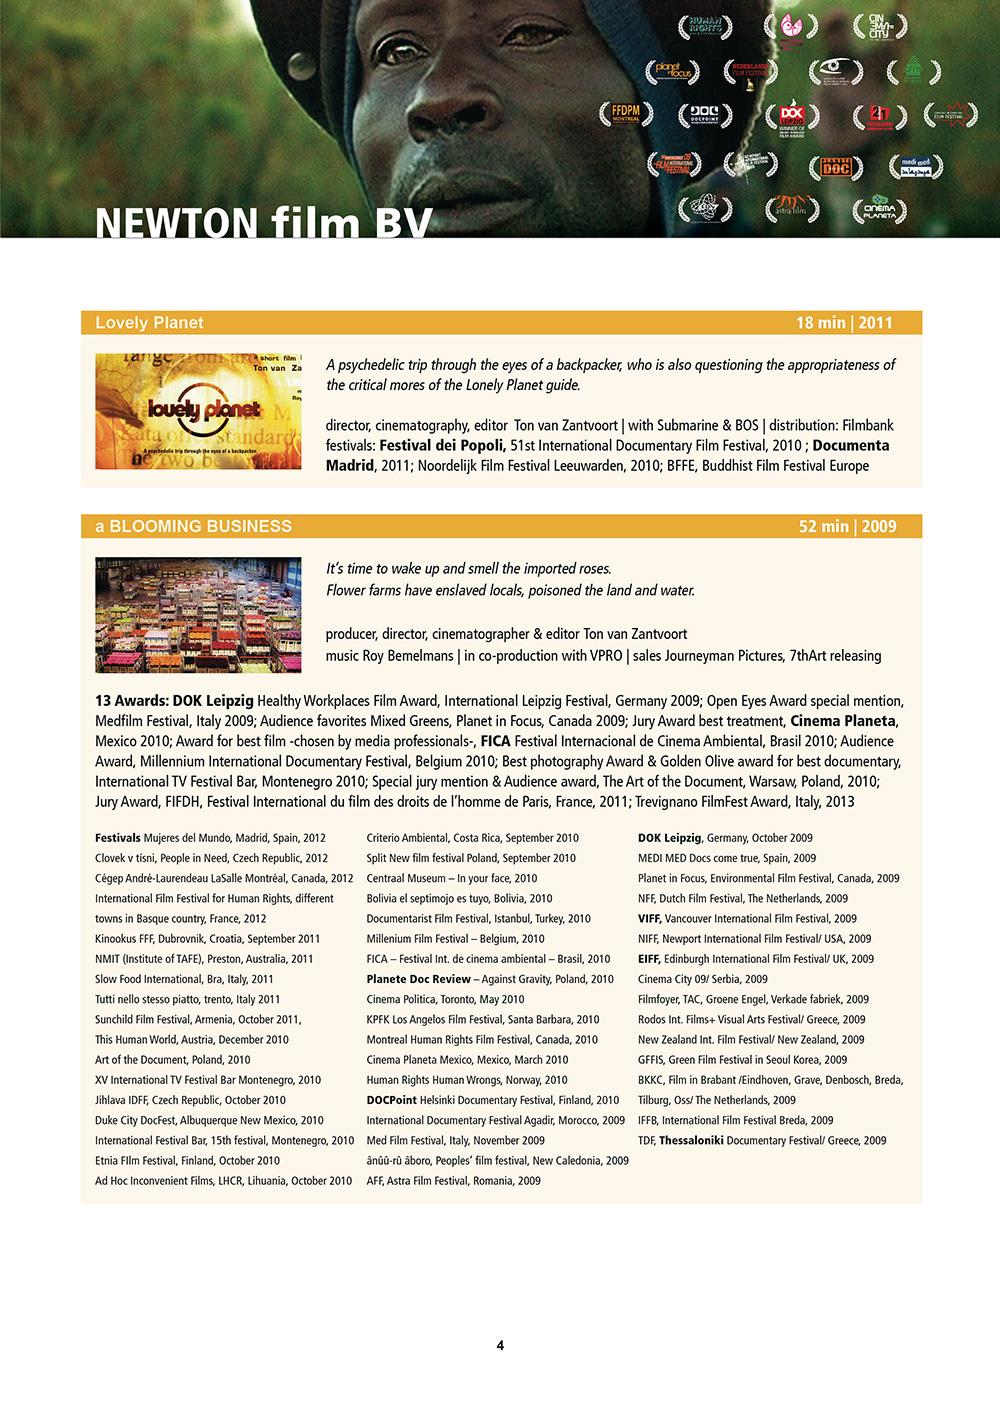 NEWTON-film-cv-page-4of5